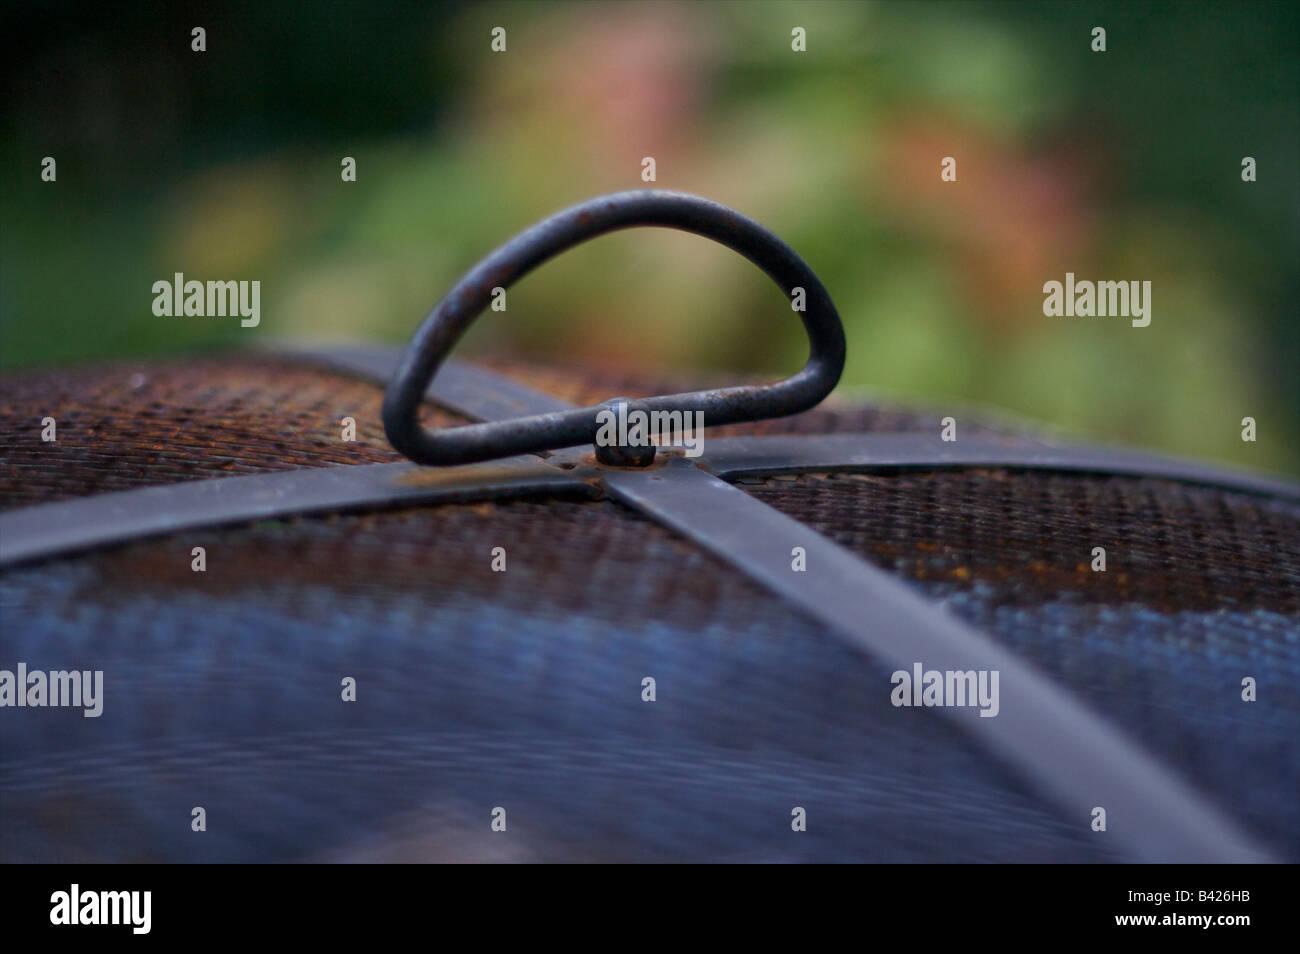 Gartenfeuerstelle Brenner Log Holz Metall Terrasse Stockfoto Bild